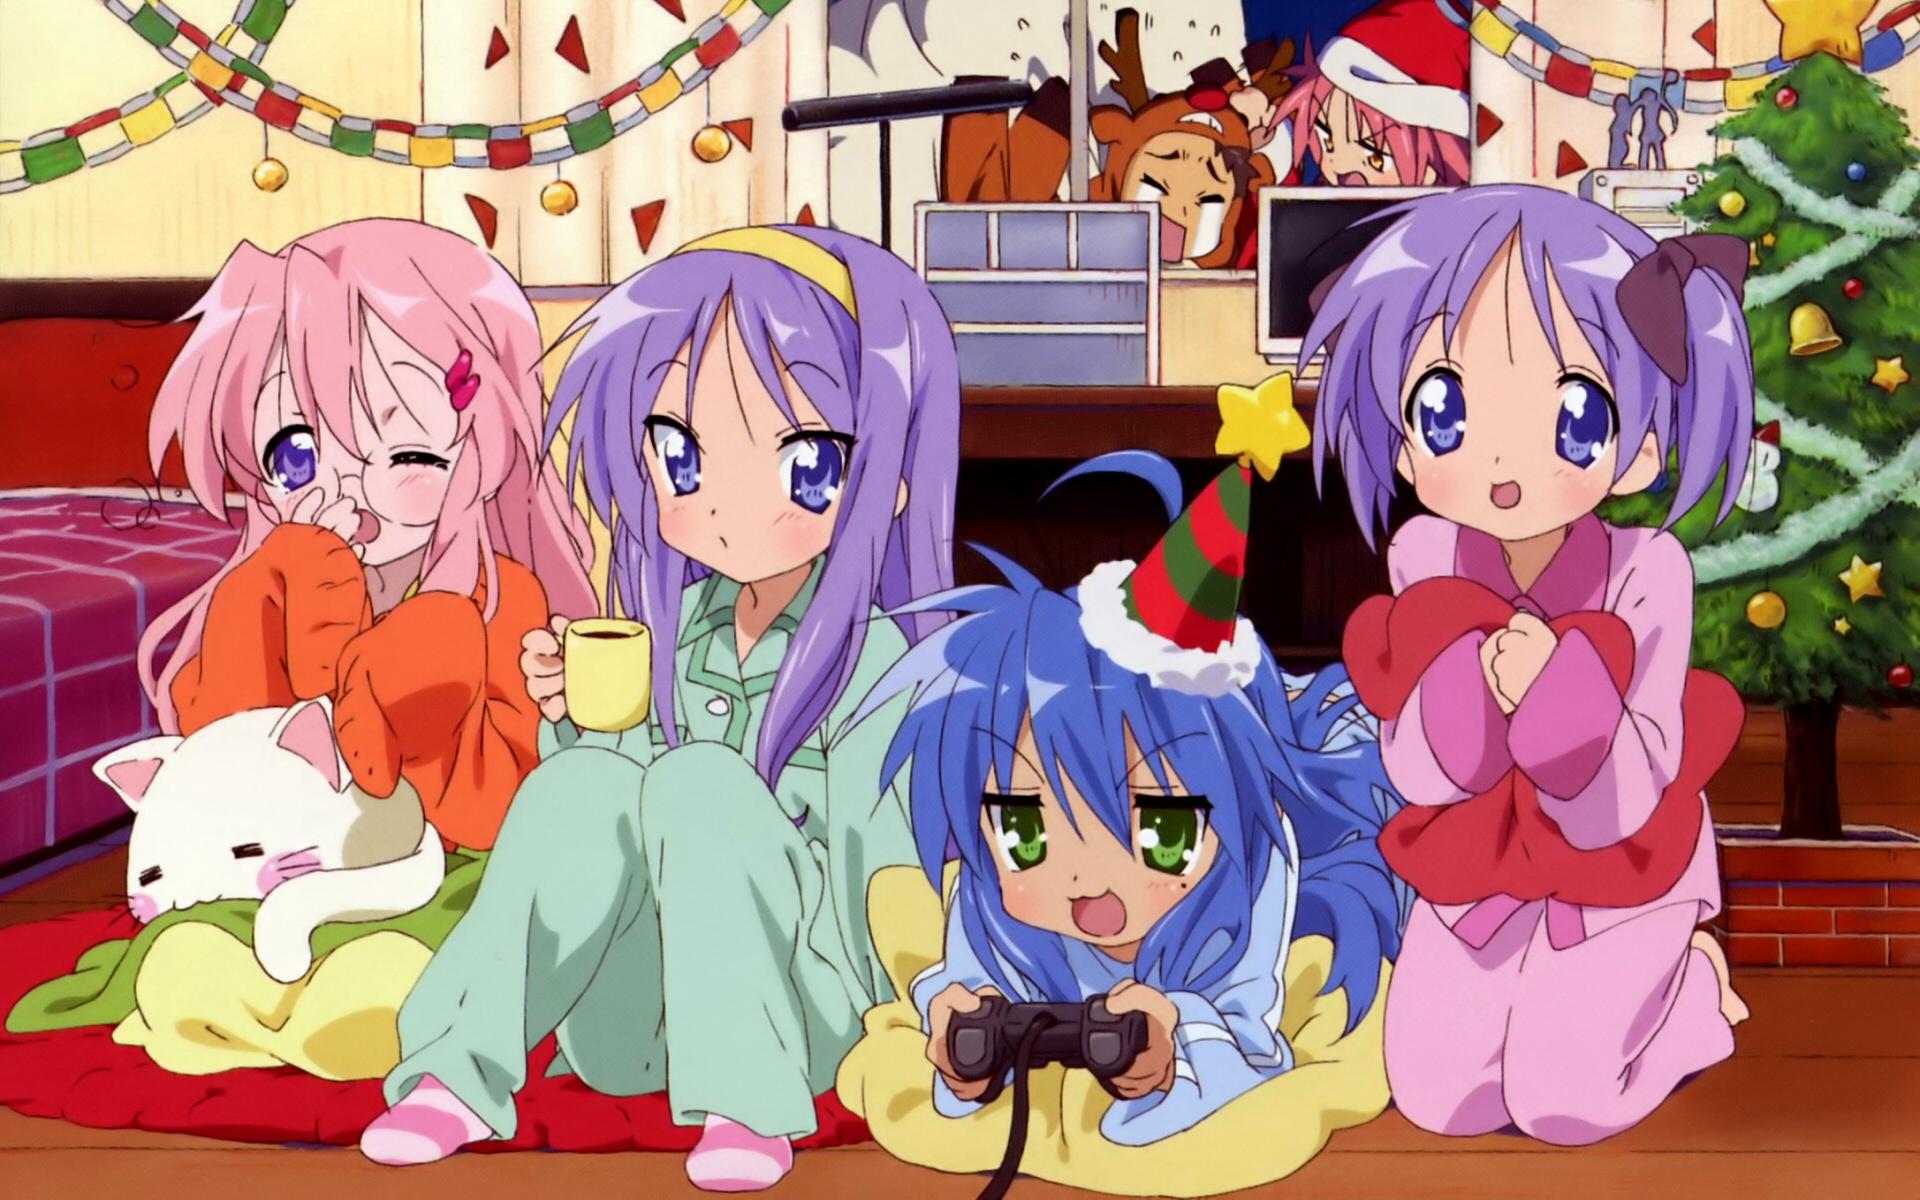 blue_eyes blue_hair blush christmas game_console green_eyes hiiragi_kagami hiiragi_tsukasa izumi_konata kogami_akira long_hair lucky_star pink_hair purple_hair shiraishi_minoru stars takara_miyuki